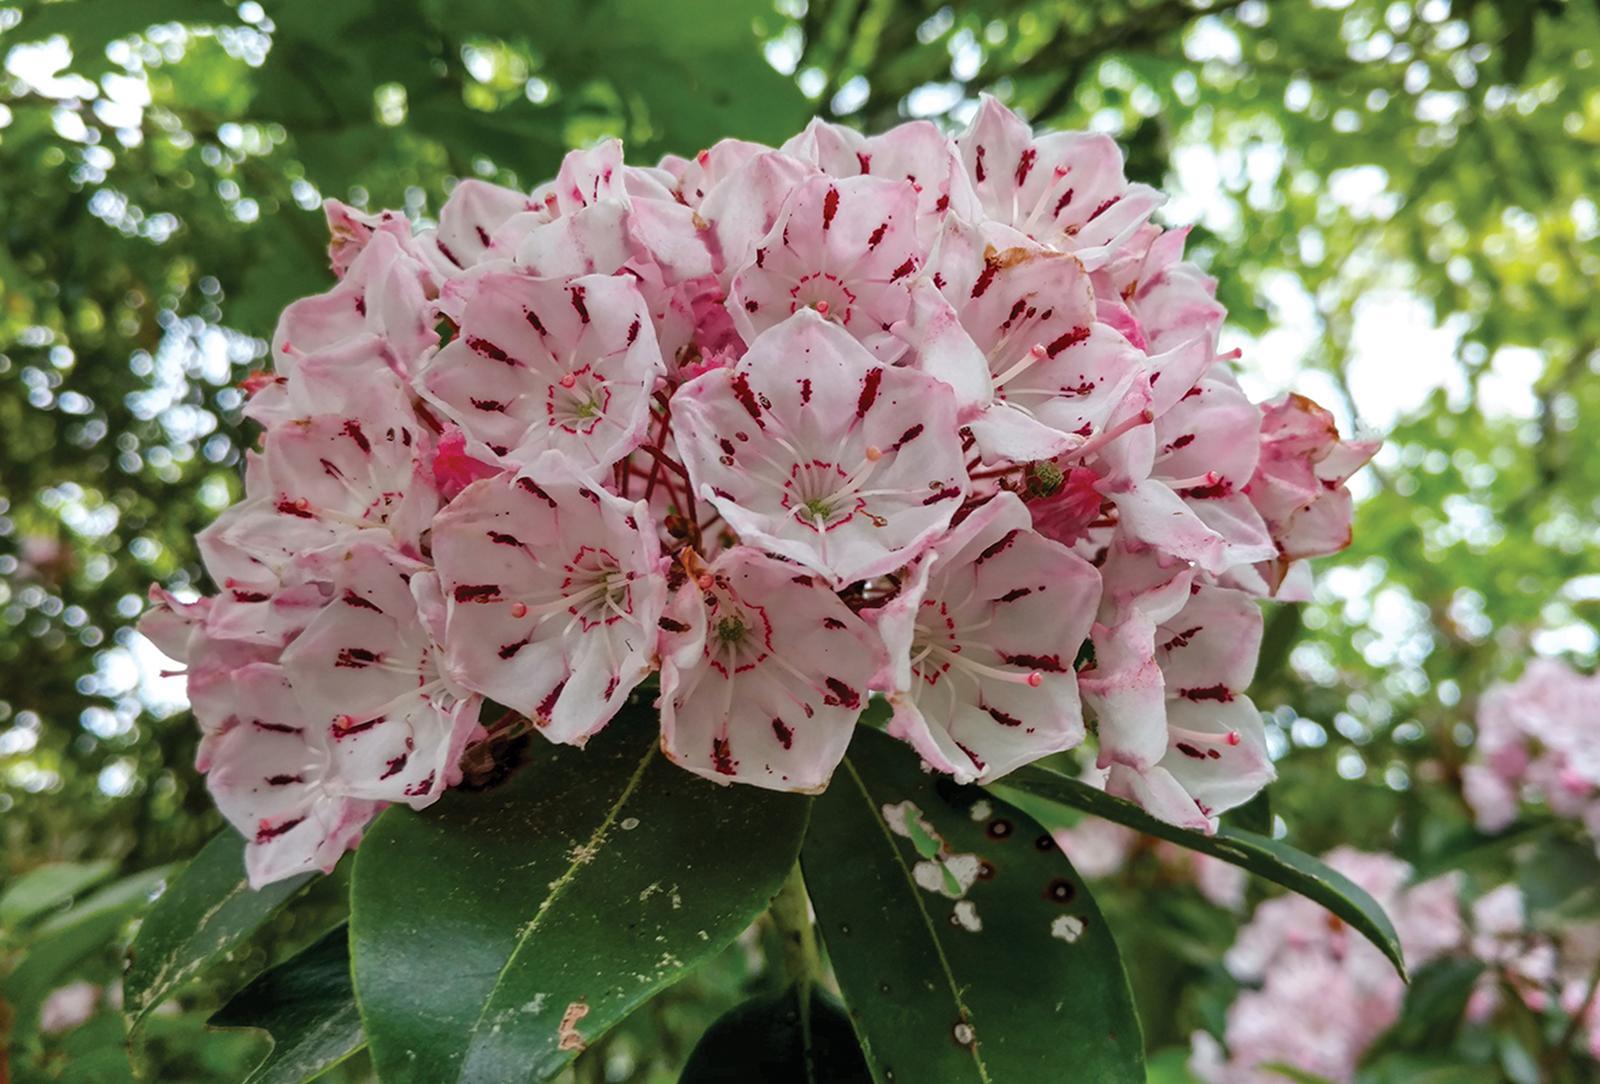 highlands cashiers land trust mountain laurel bloom